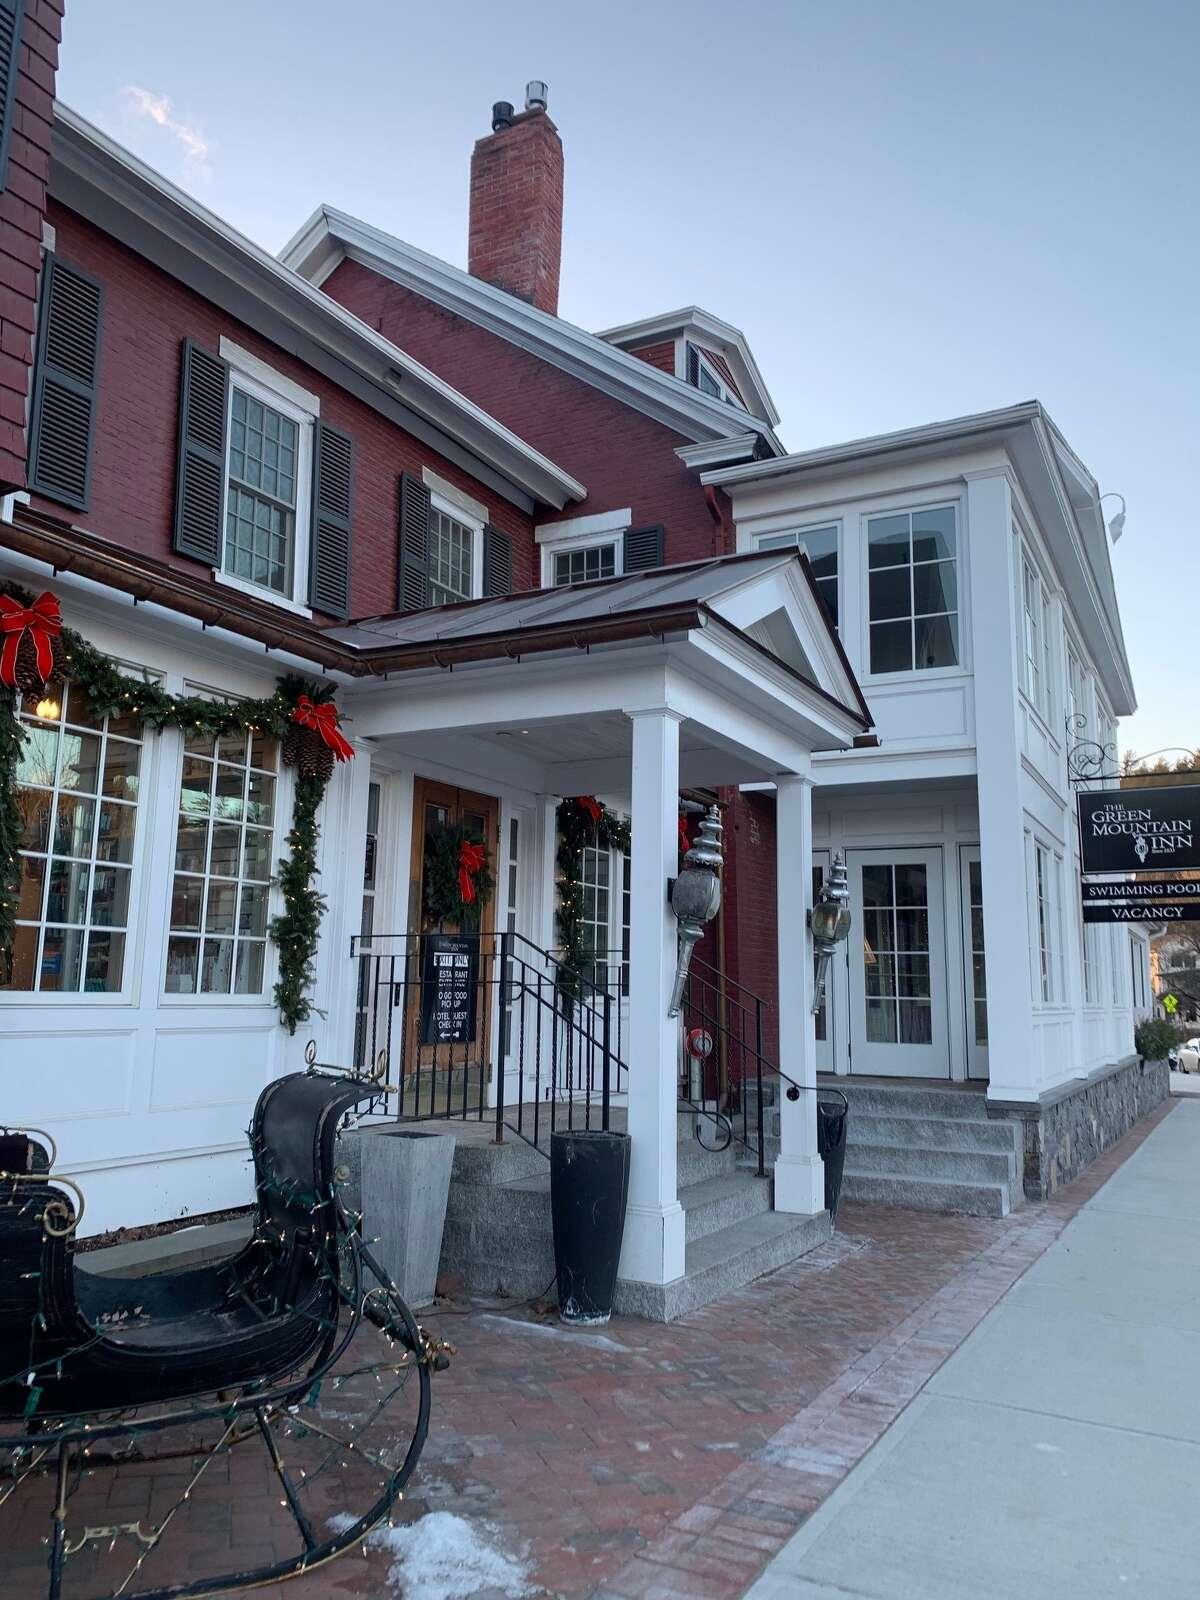 Quaint shops dot the town of Stowe, Vermont.